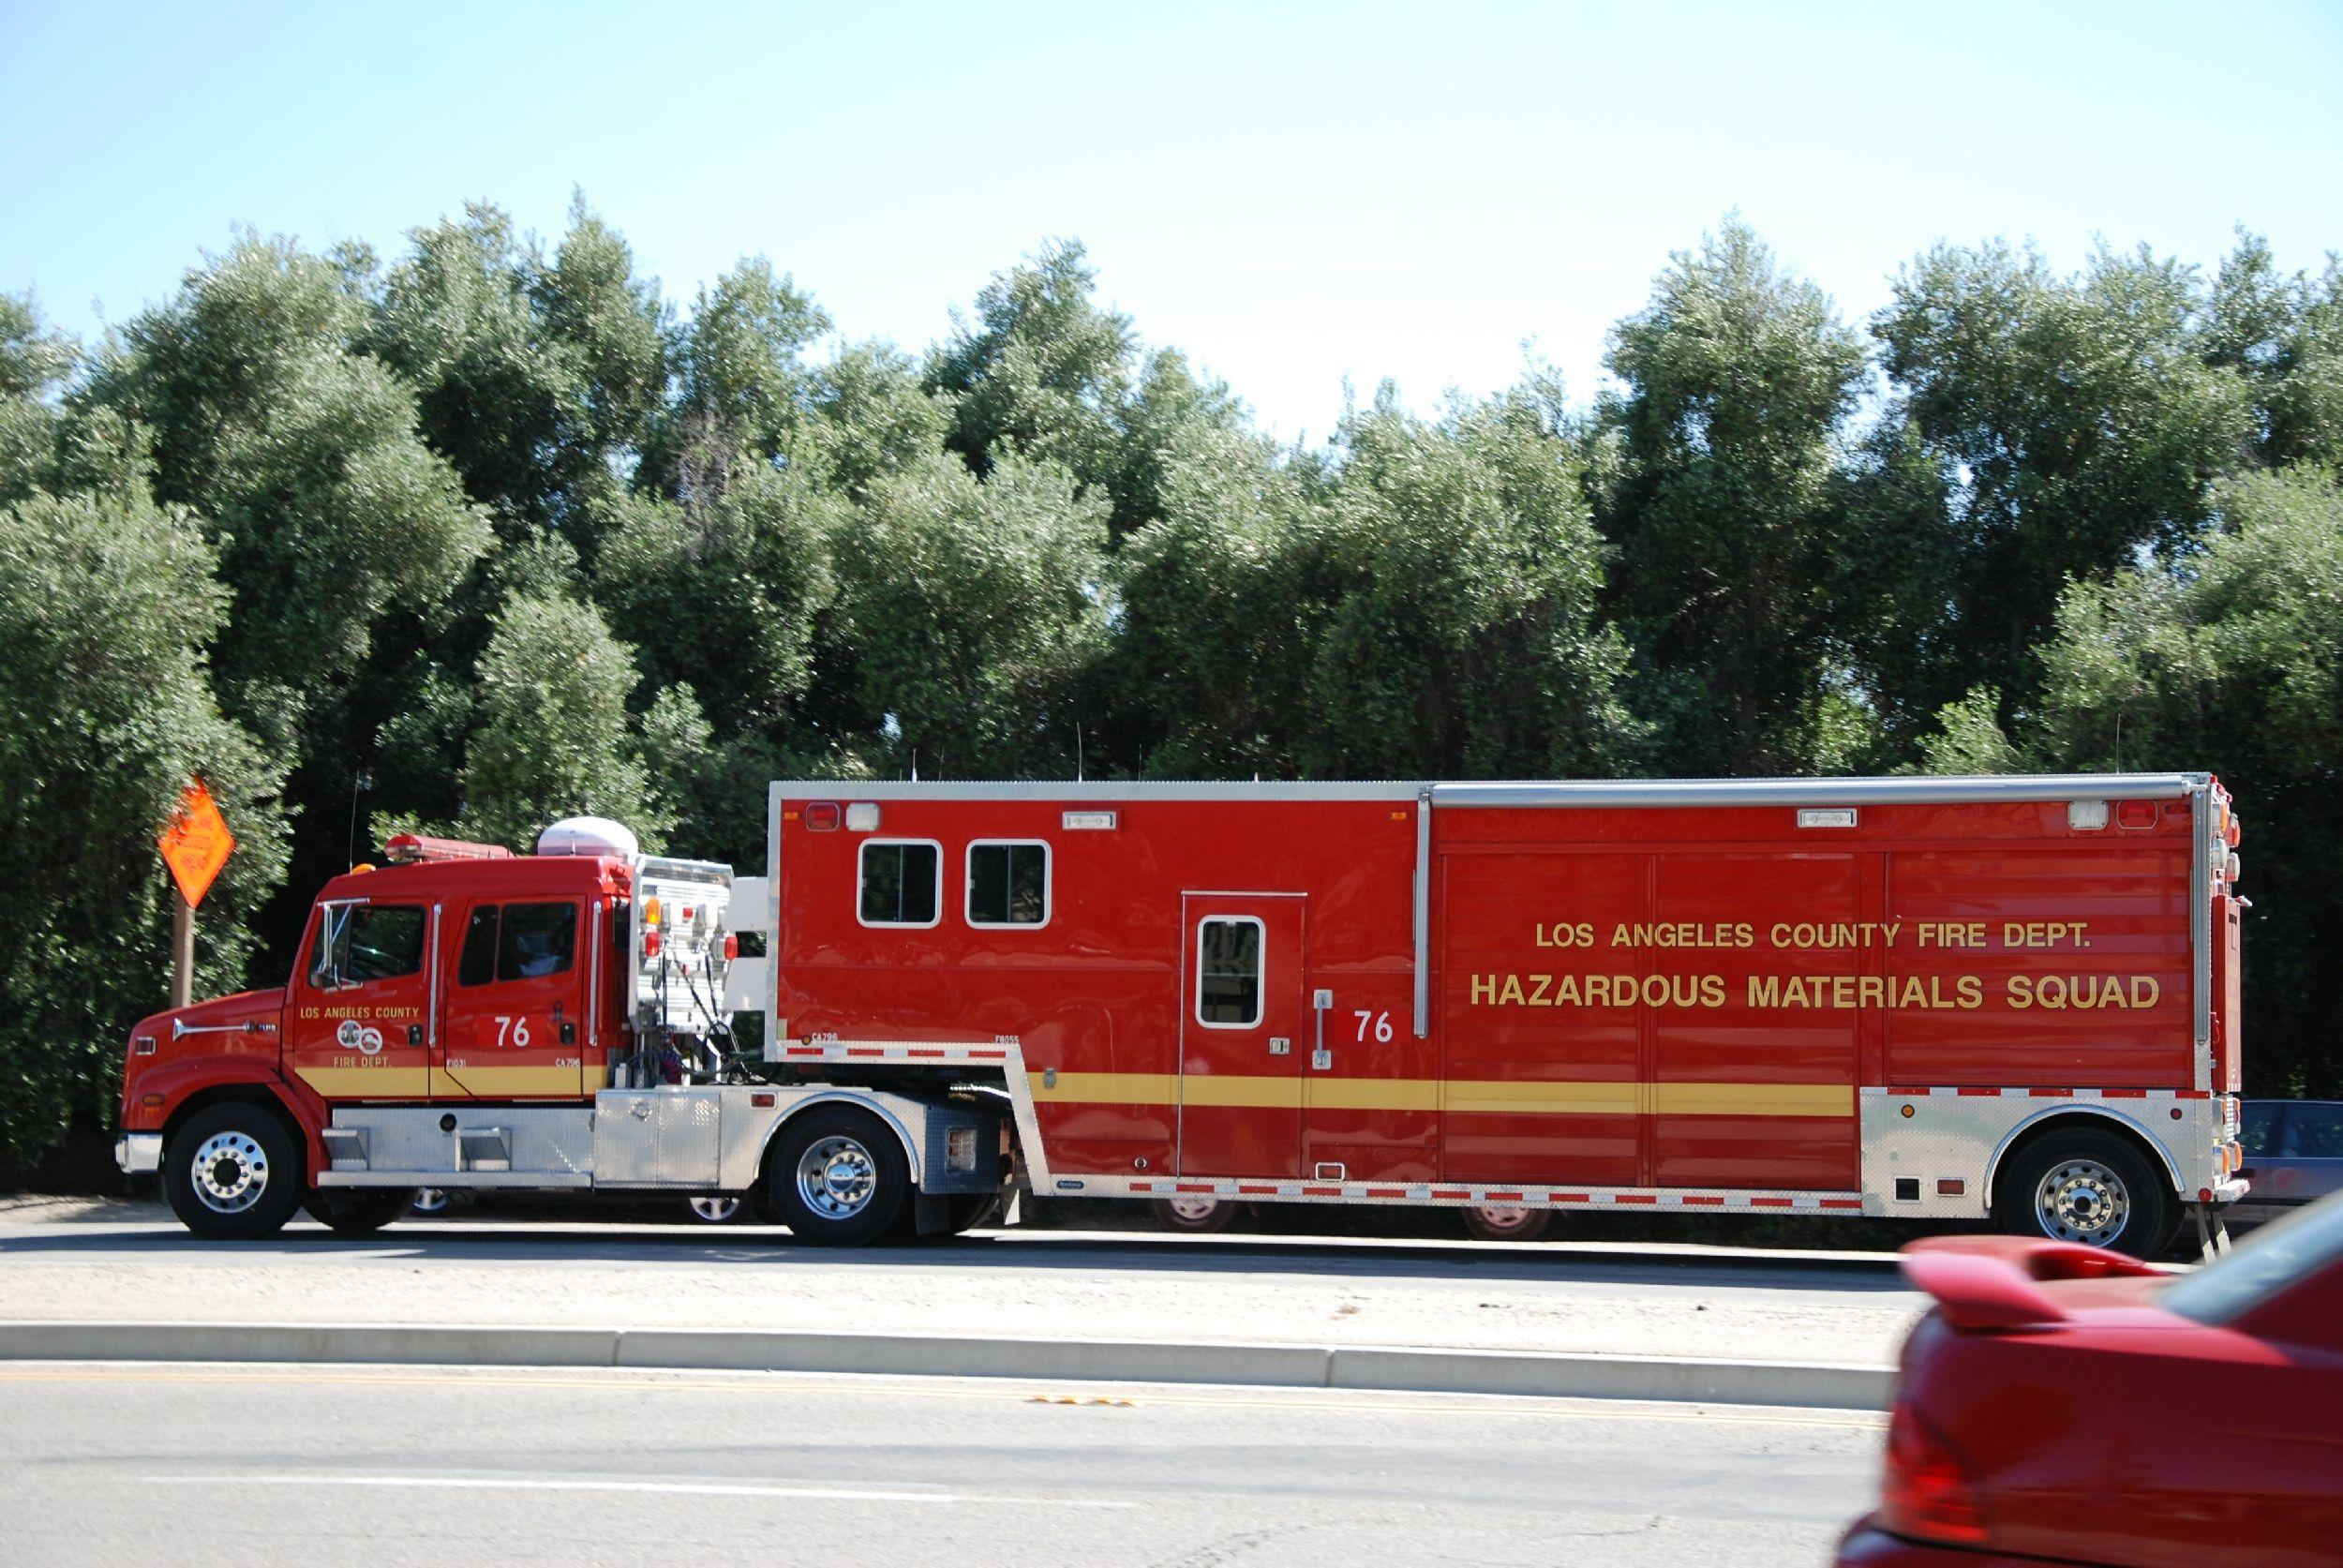 Lacofd Hazmat 76 Hazardous Material Squad La County